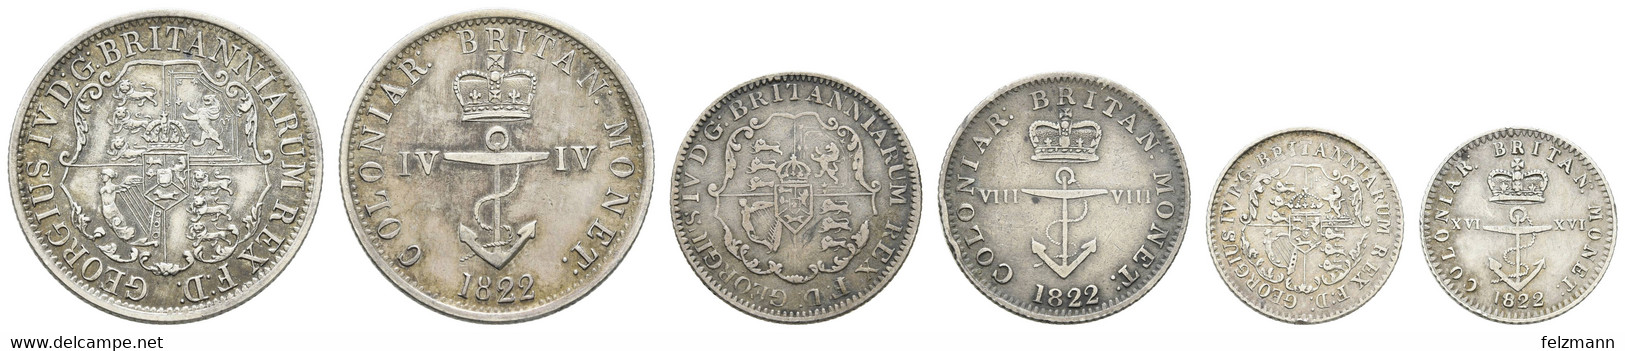 1/16, 1/8, 1/4 Dollar, 1822, Anchor Money, KM 1,2,3, Ss+,vz,vz - Colonies